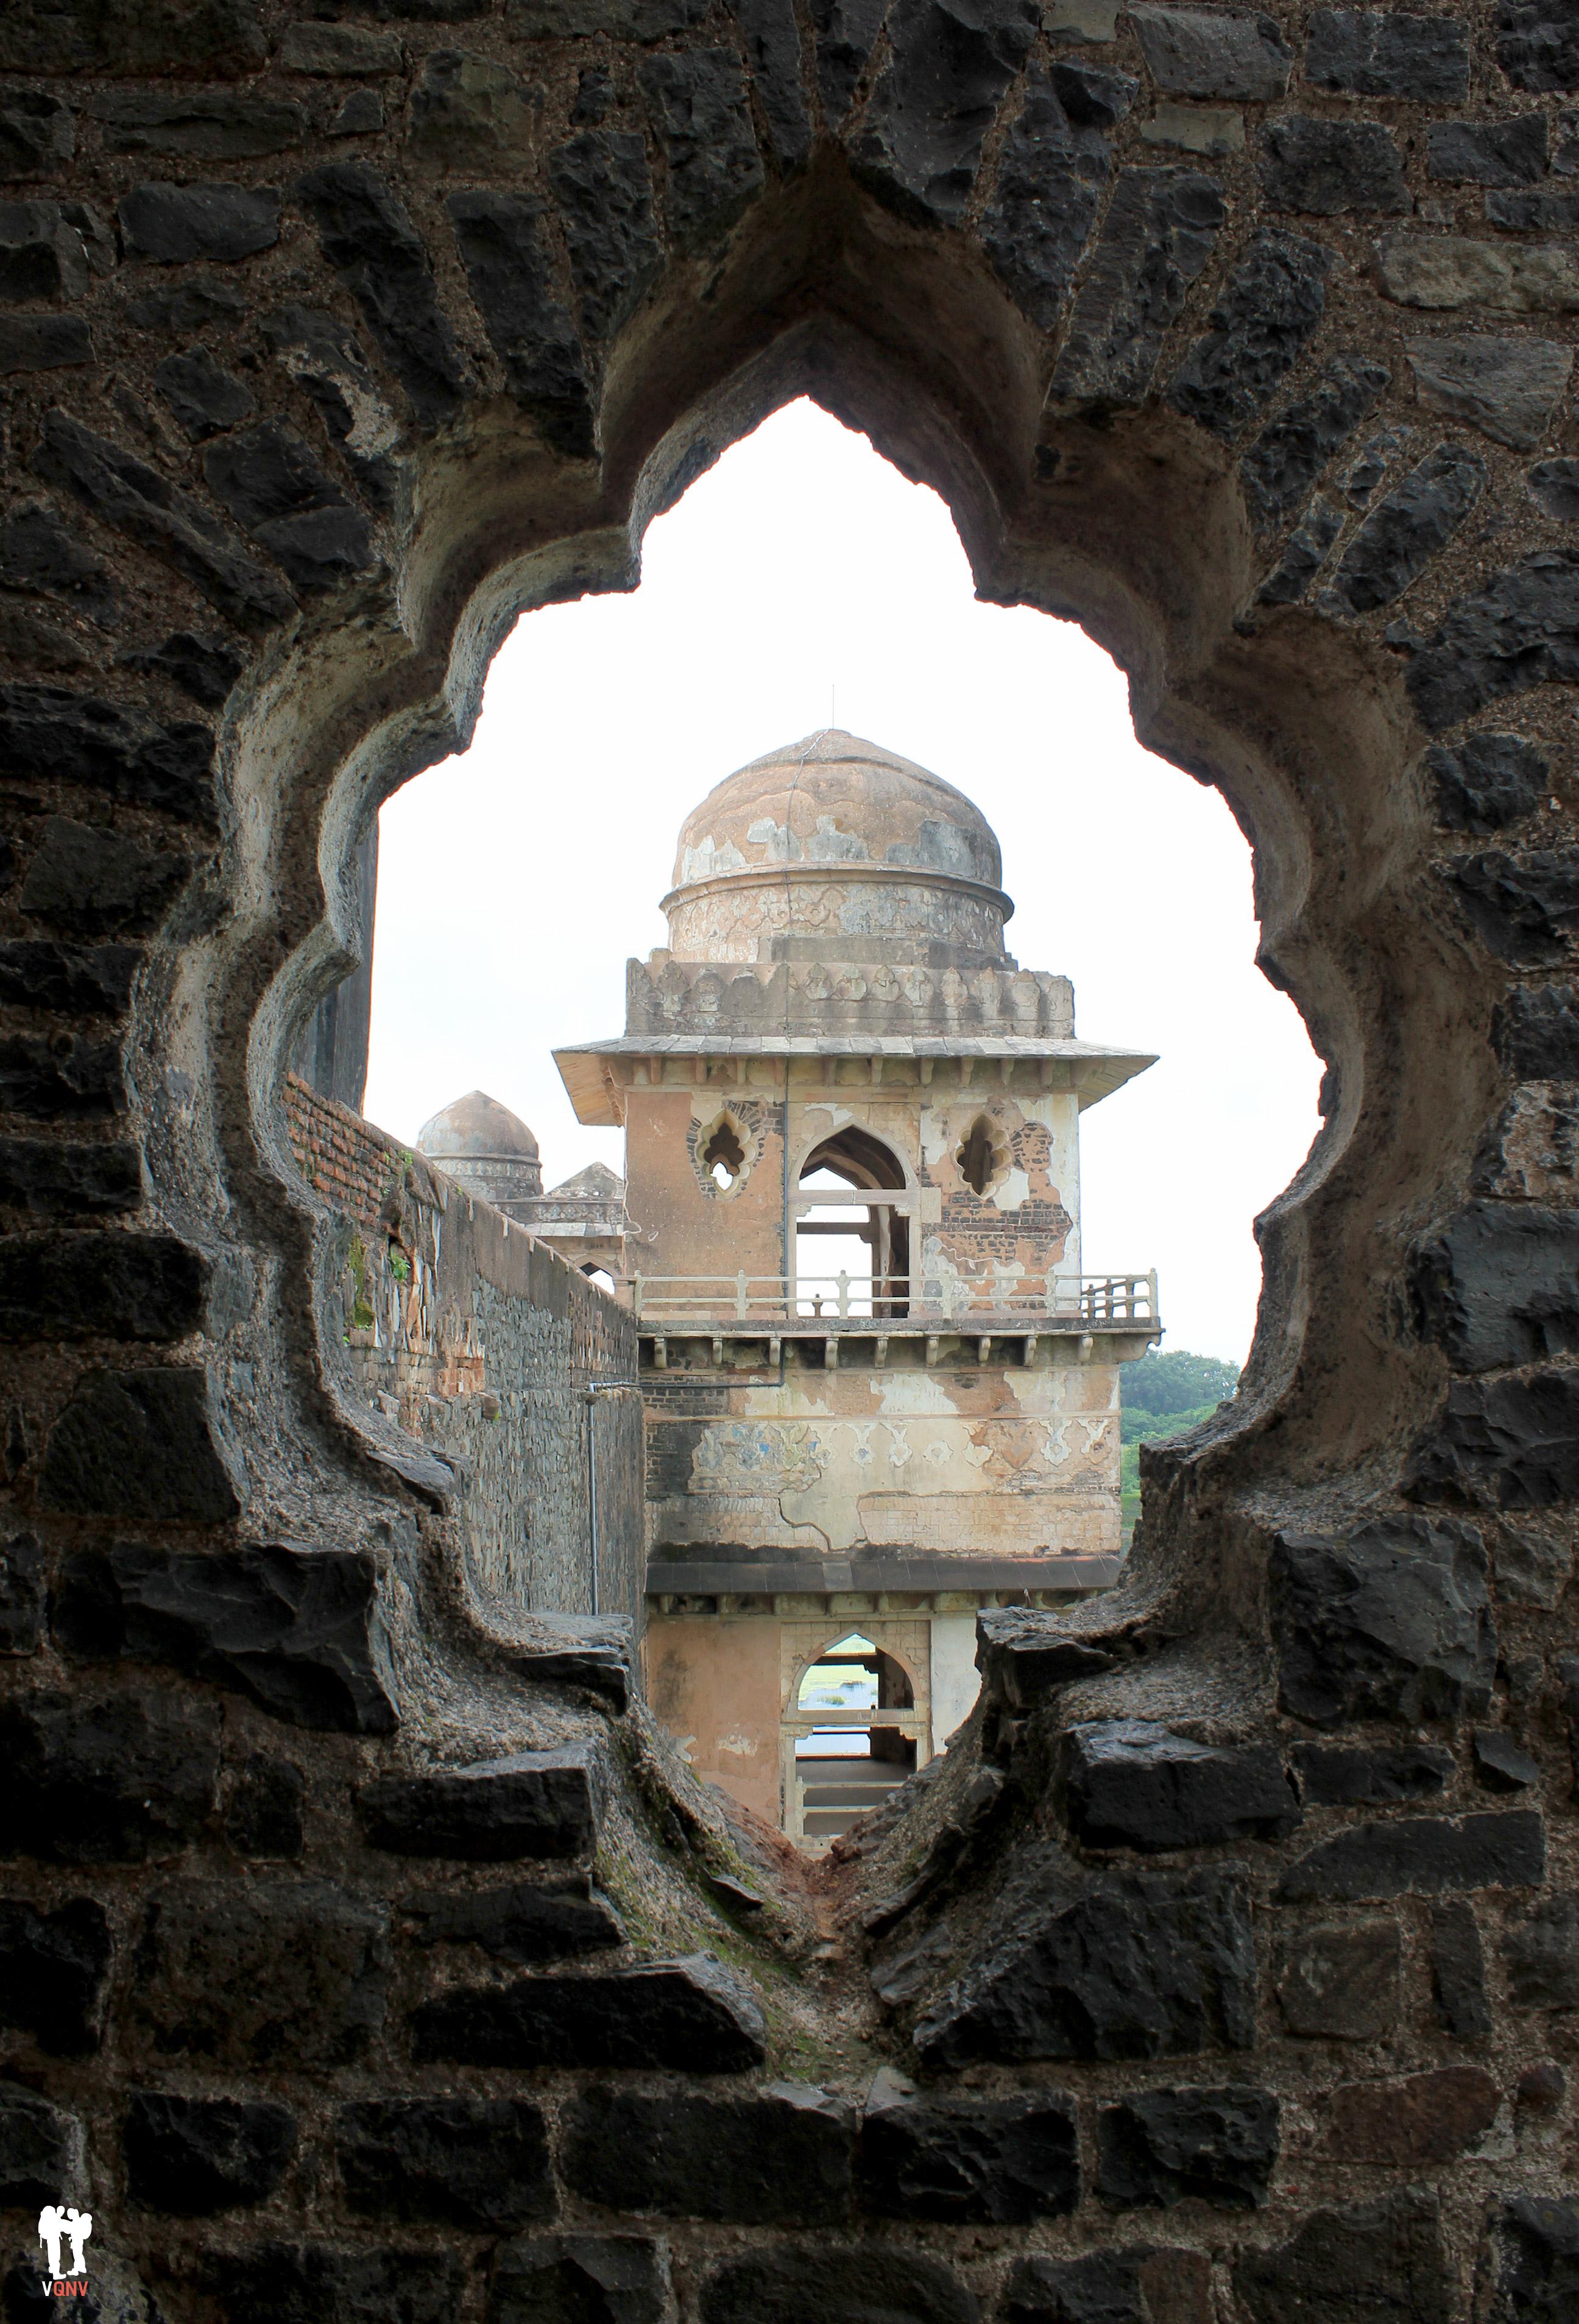 Rincones de Jahaz Mahal